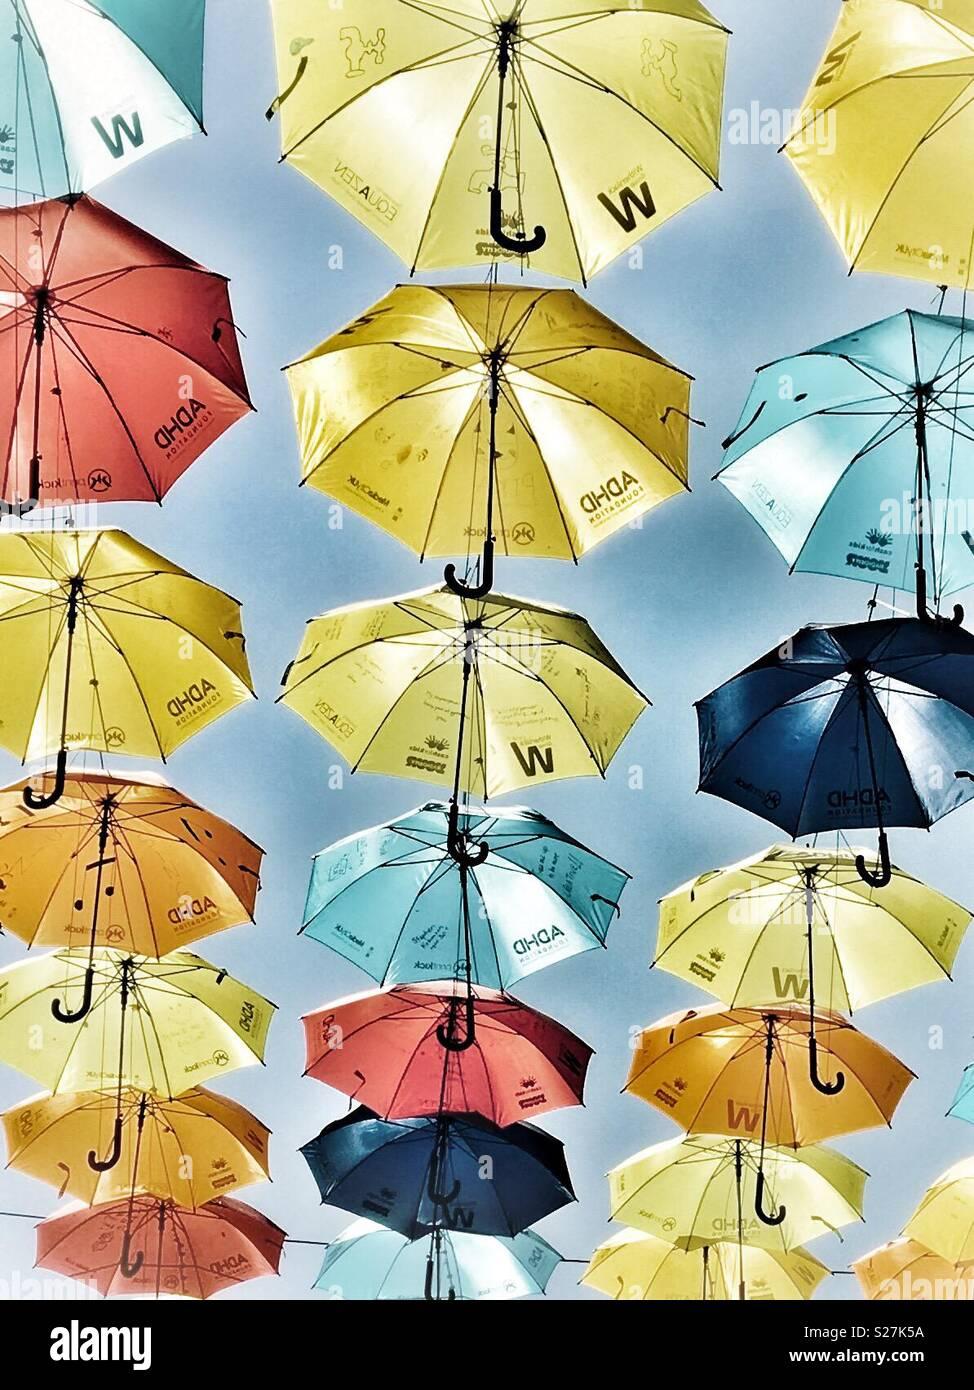 Colourful umbrellas. - Stock Image